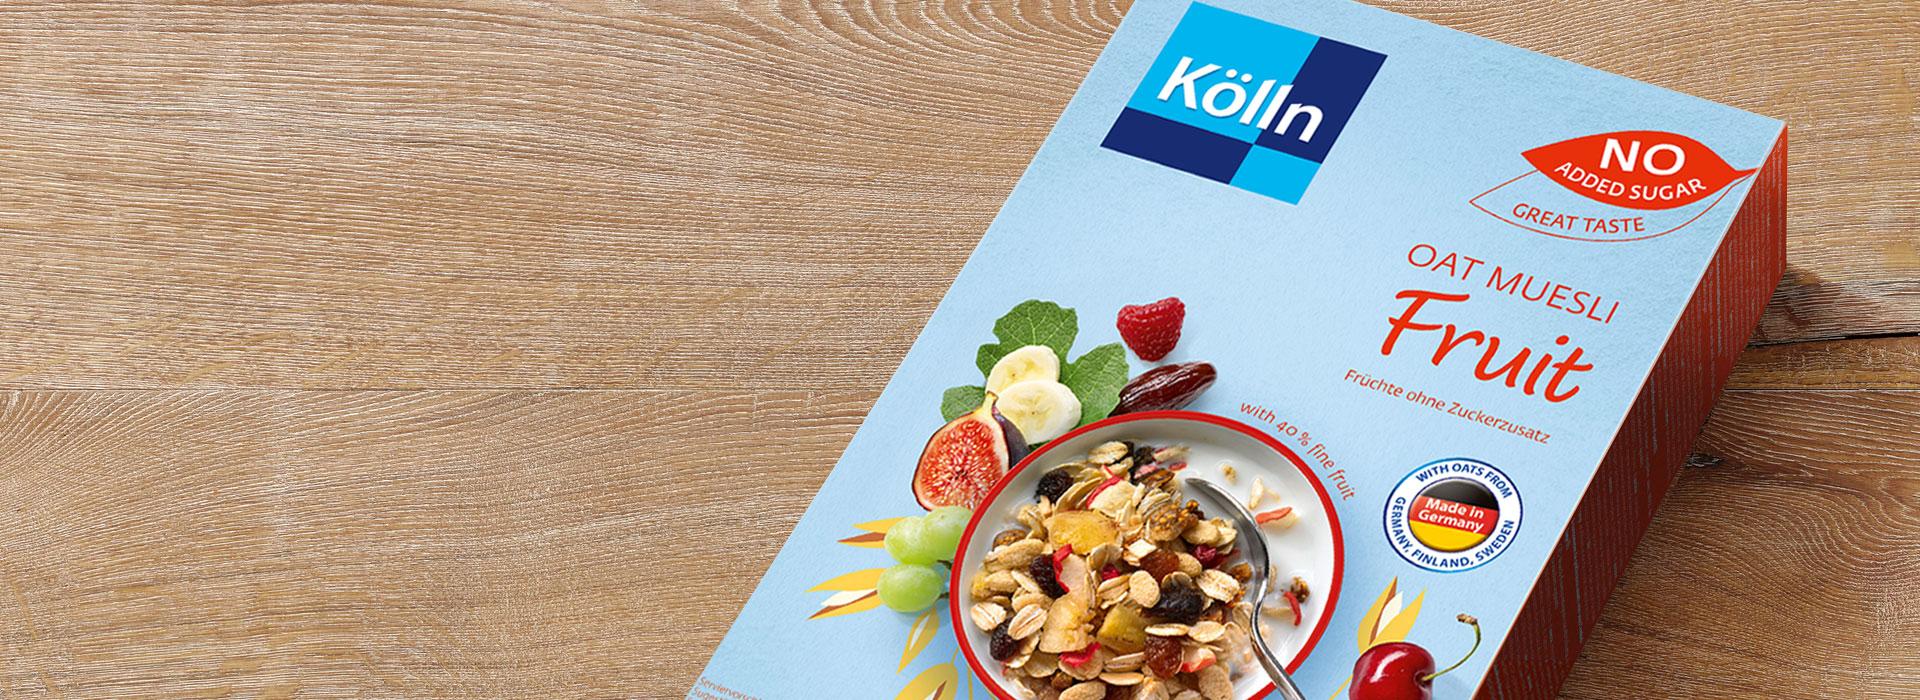 Koelln Oat Muesli Fruit no added sugar Pack on Table